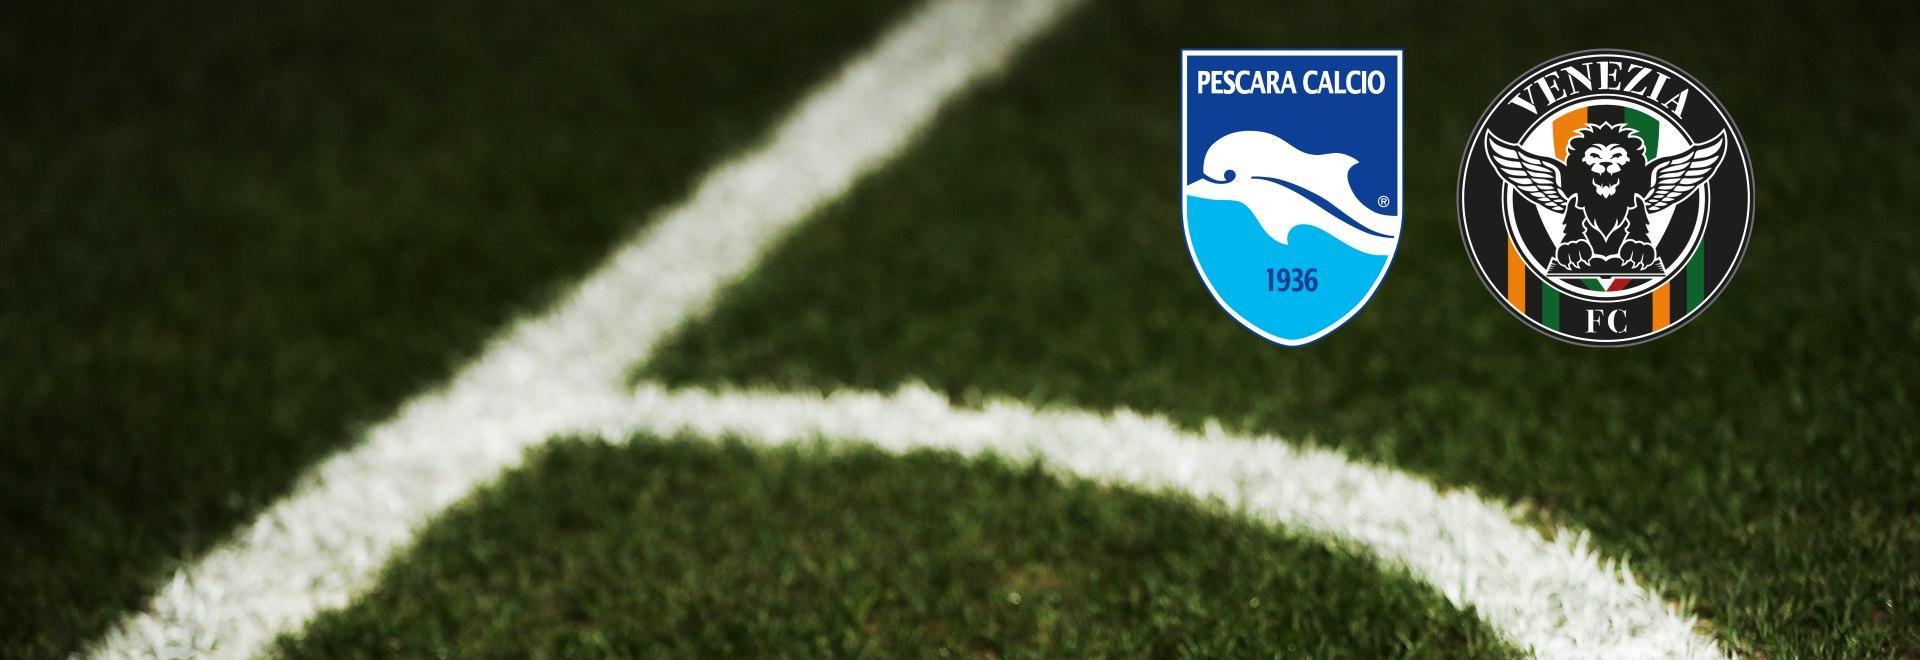 Pescara - Venezia. 15a g.